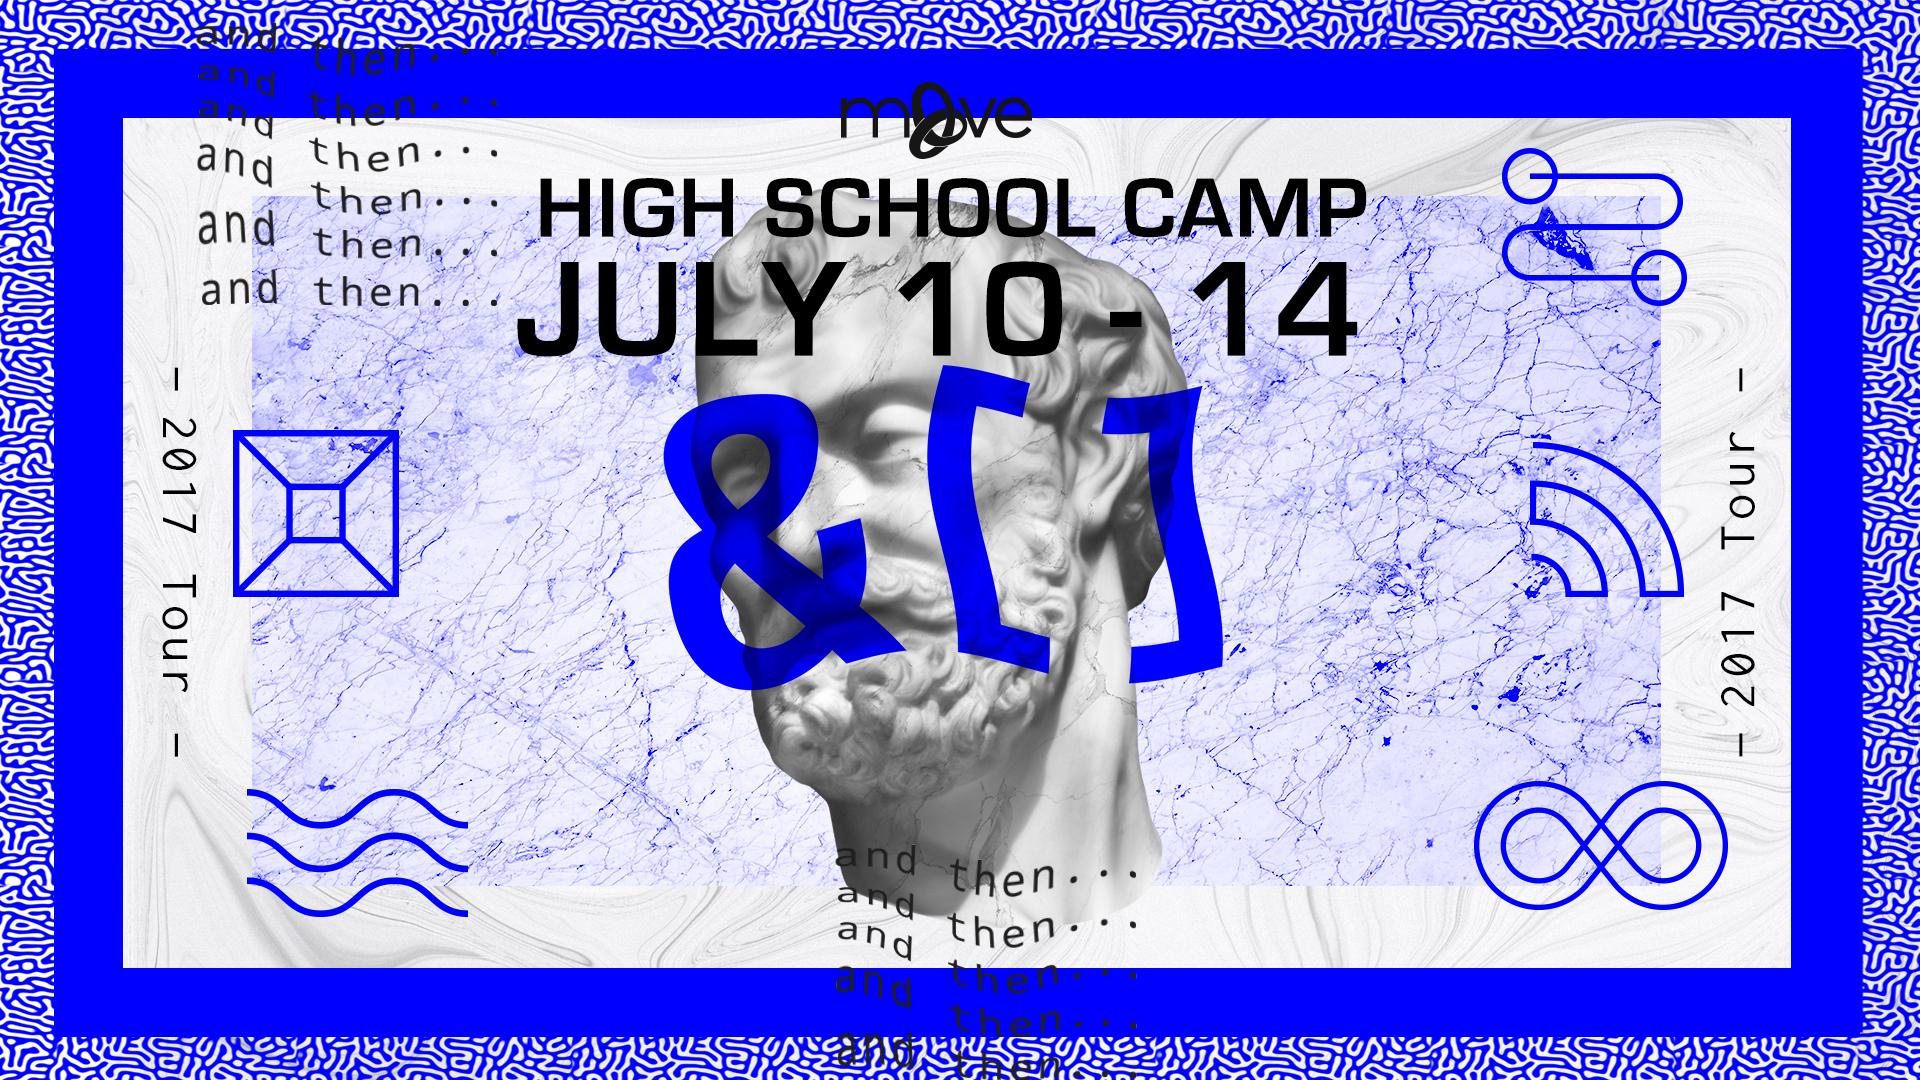 highschoolcamp2017.jpg